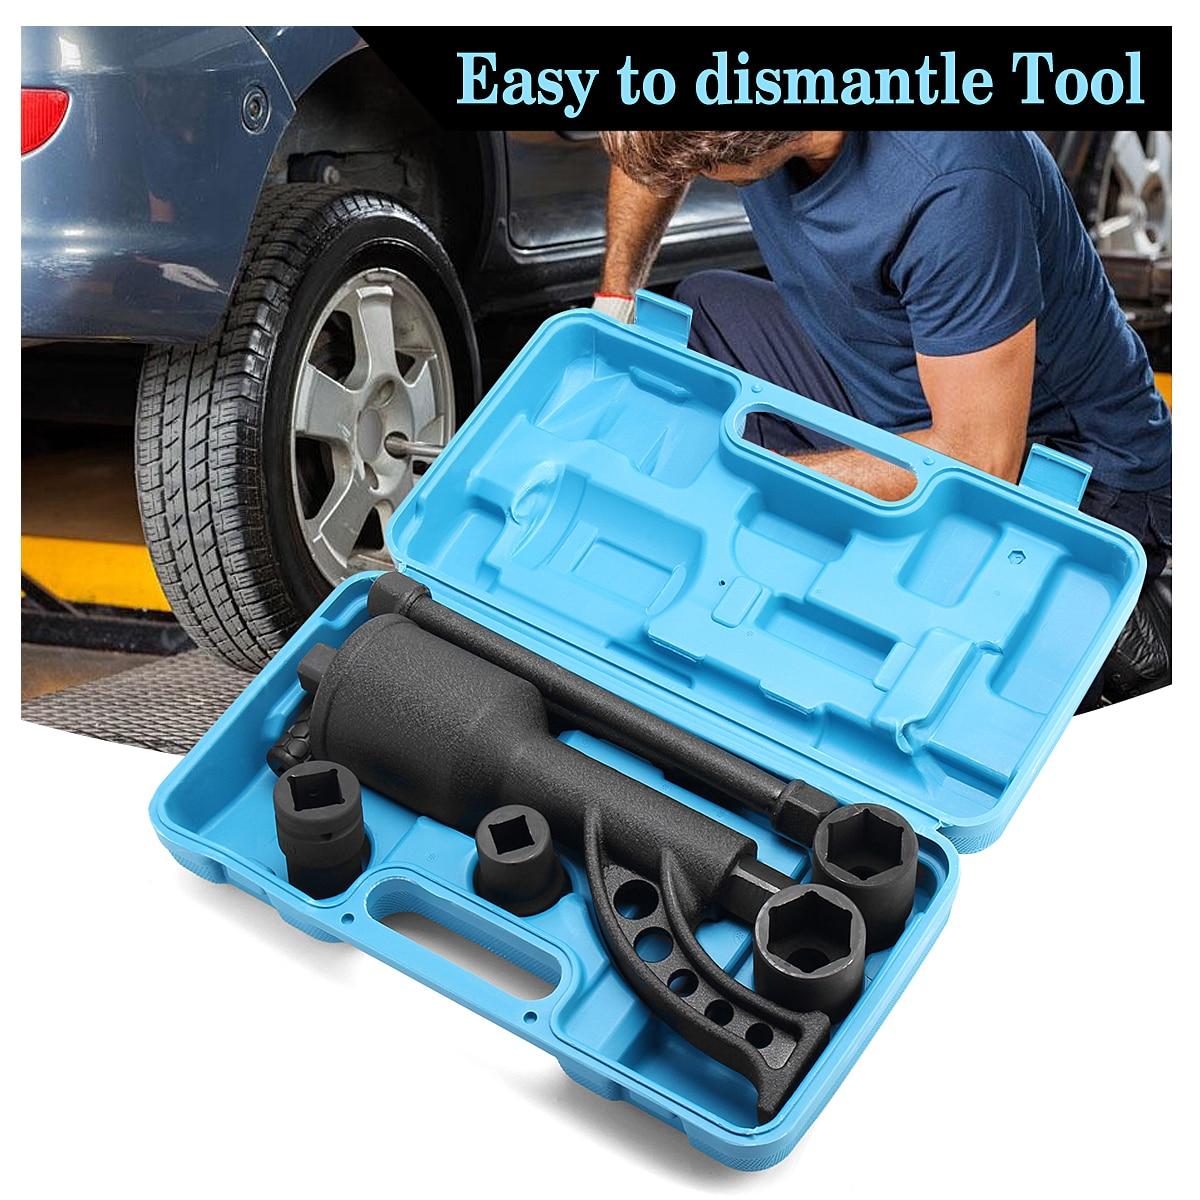 7 PCS Heavy Duty Torque Multiplier Wrench Lug Nut Lugnuts Remover Labor Saving Socket Car Wash Maintenance Engine Care